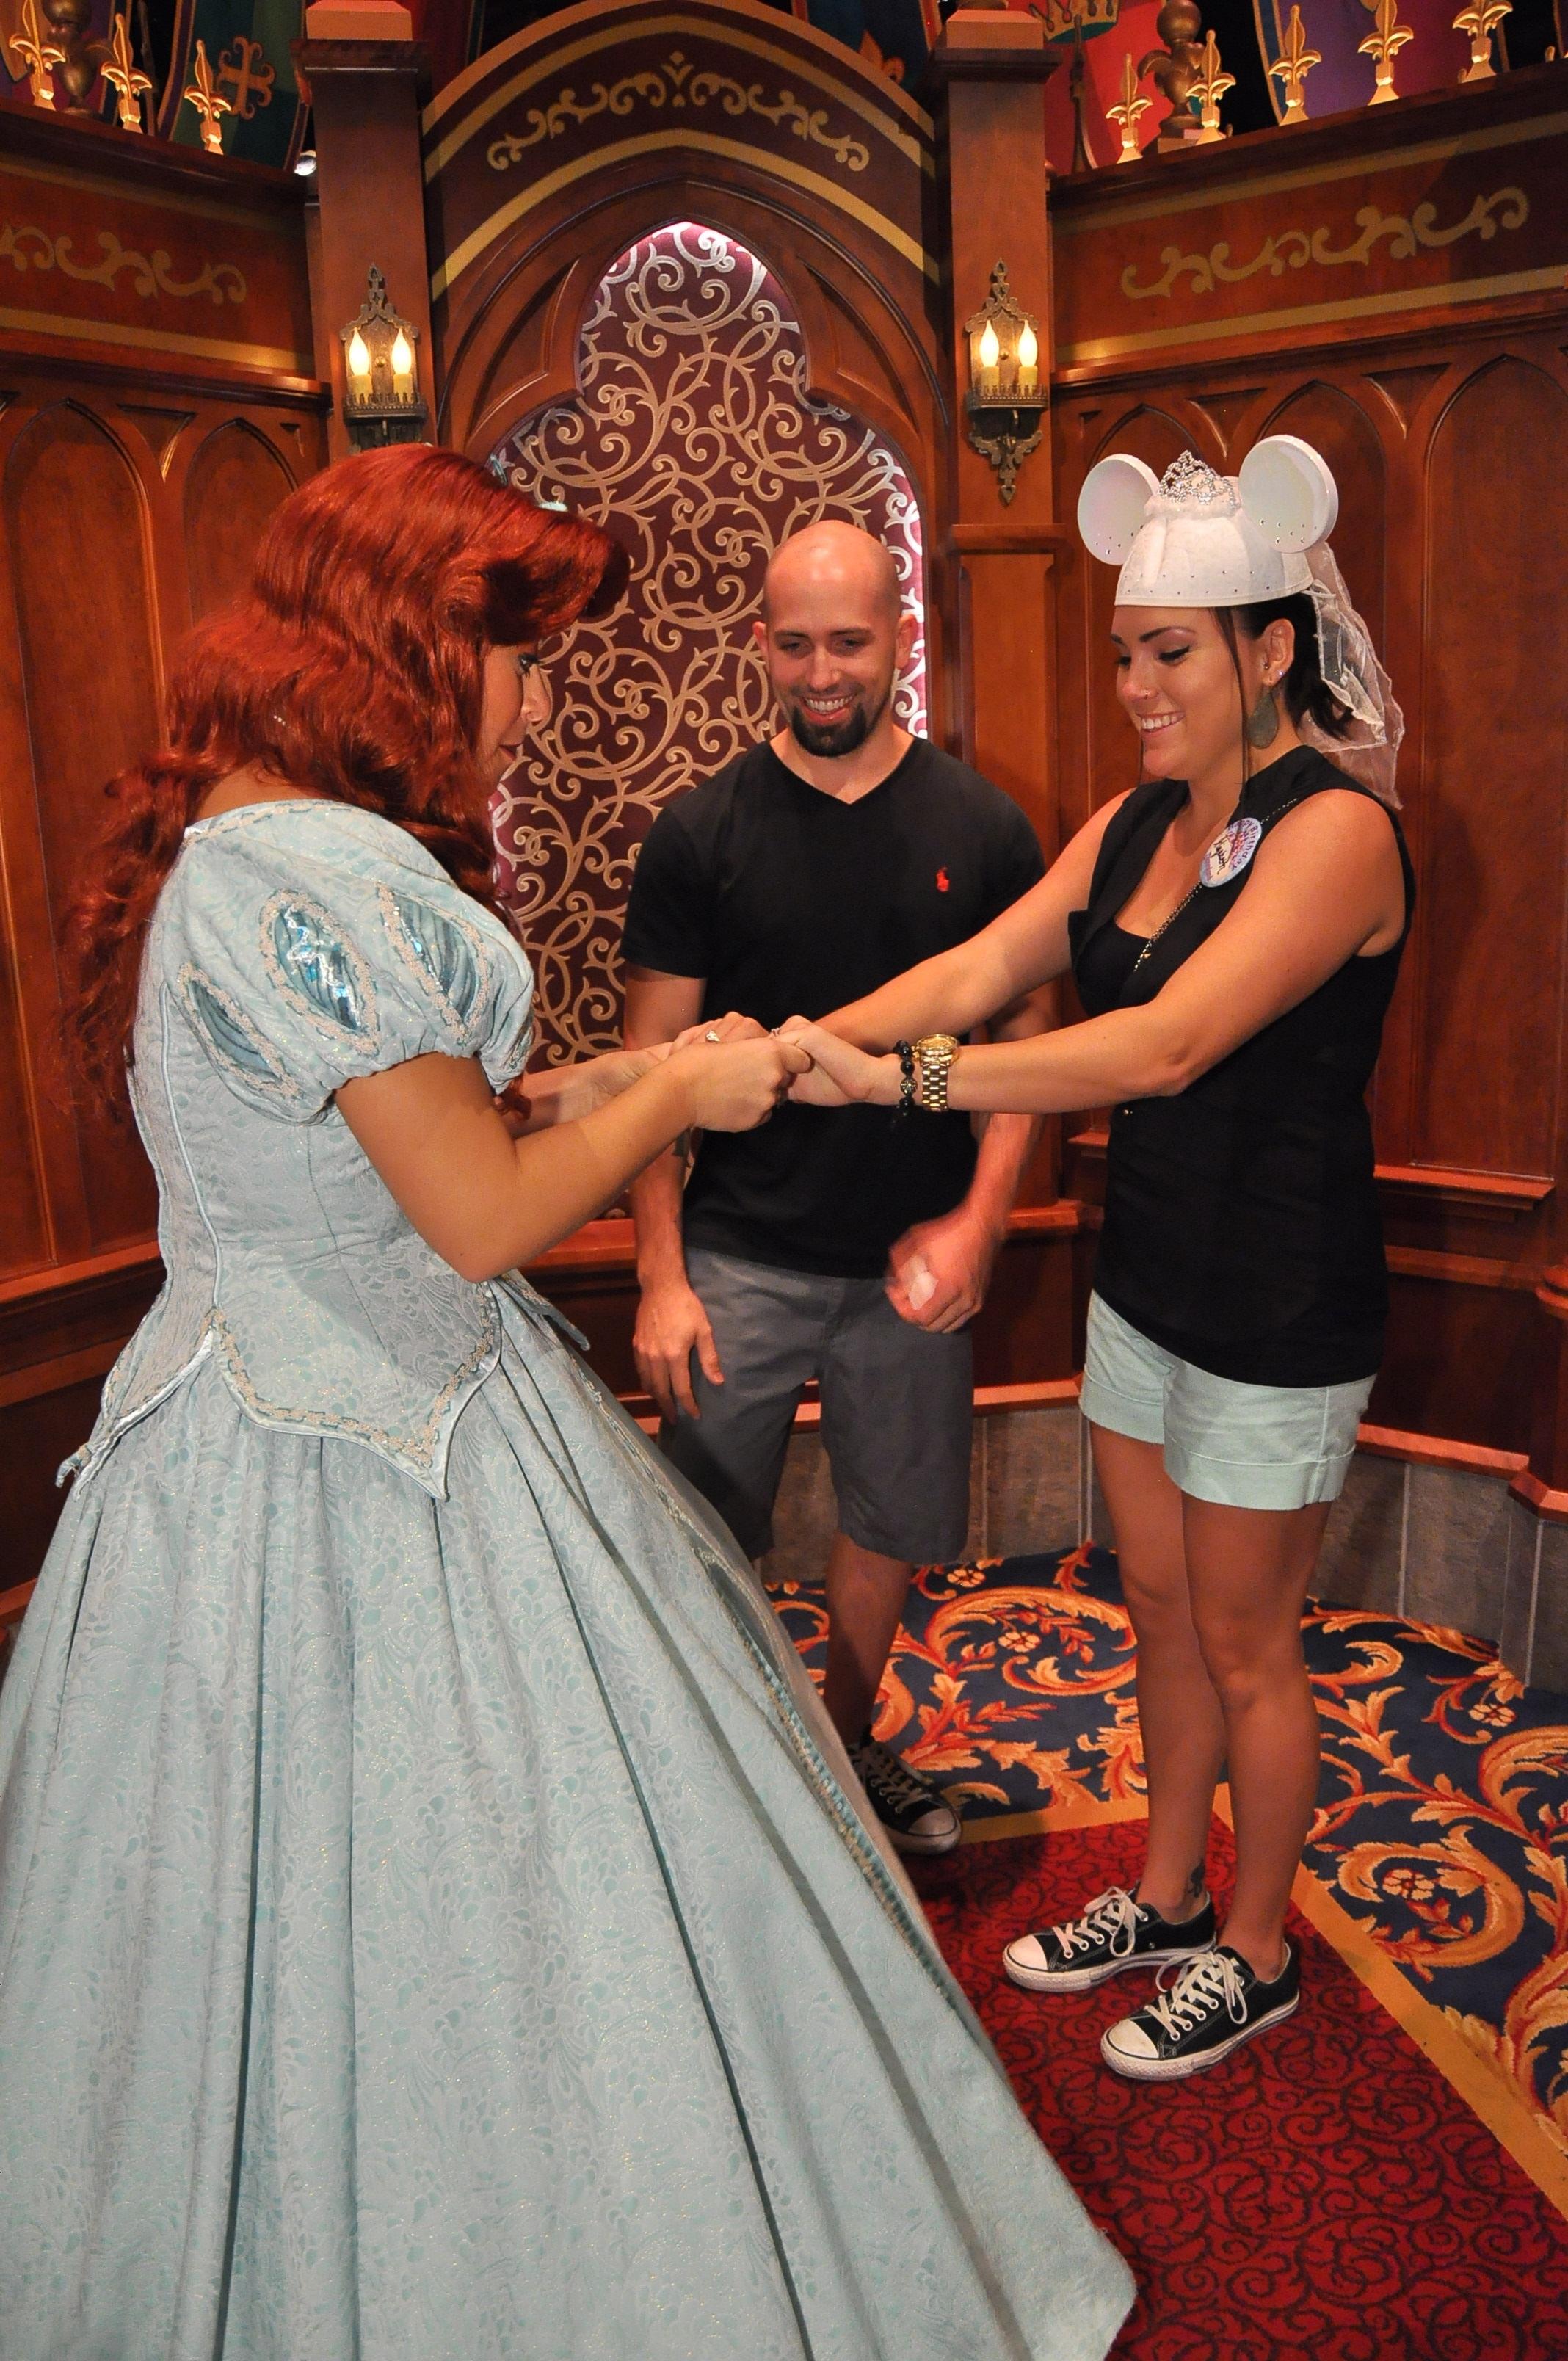 Image 8 of Elizabeth and Tommy's Disneyland Proposal